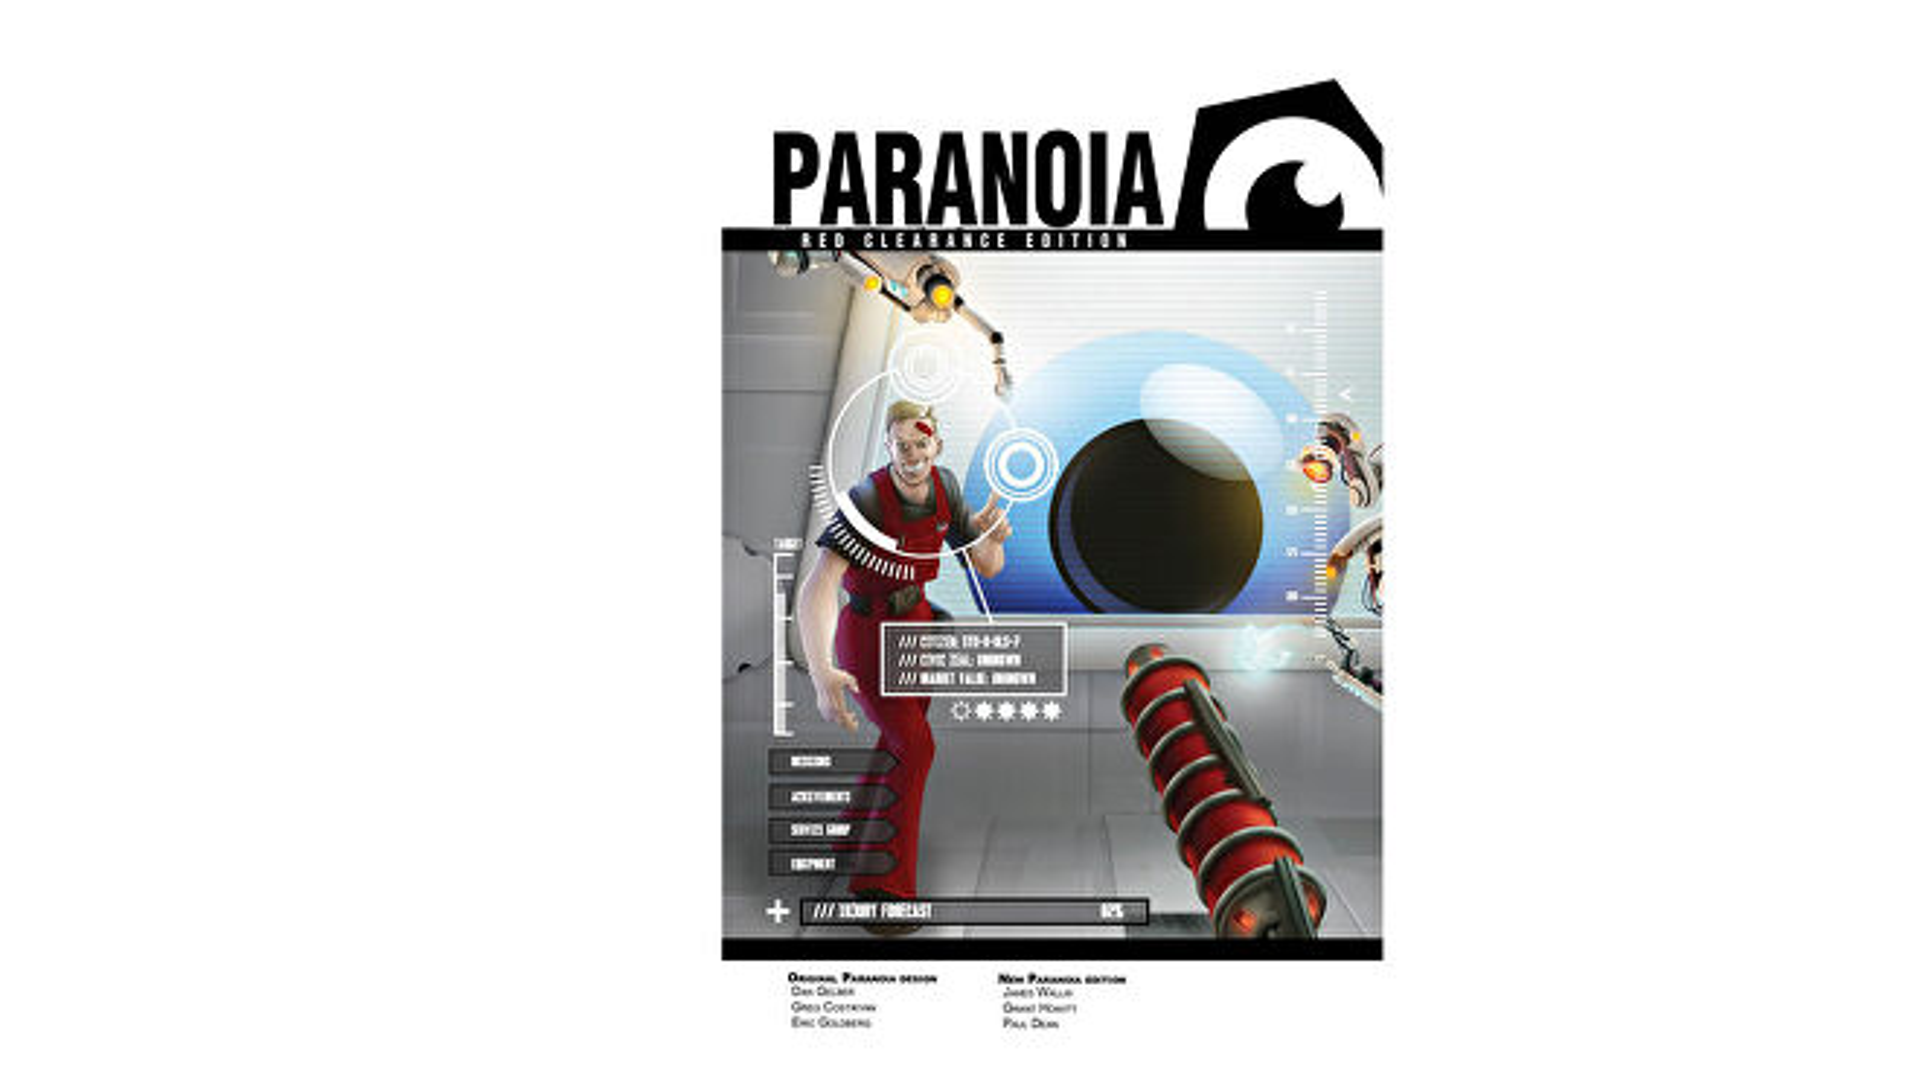 ParanoiatabletopRPG_Book.jpg